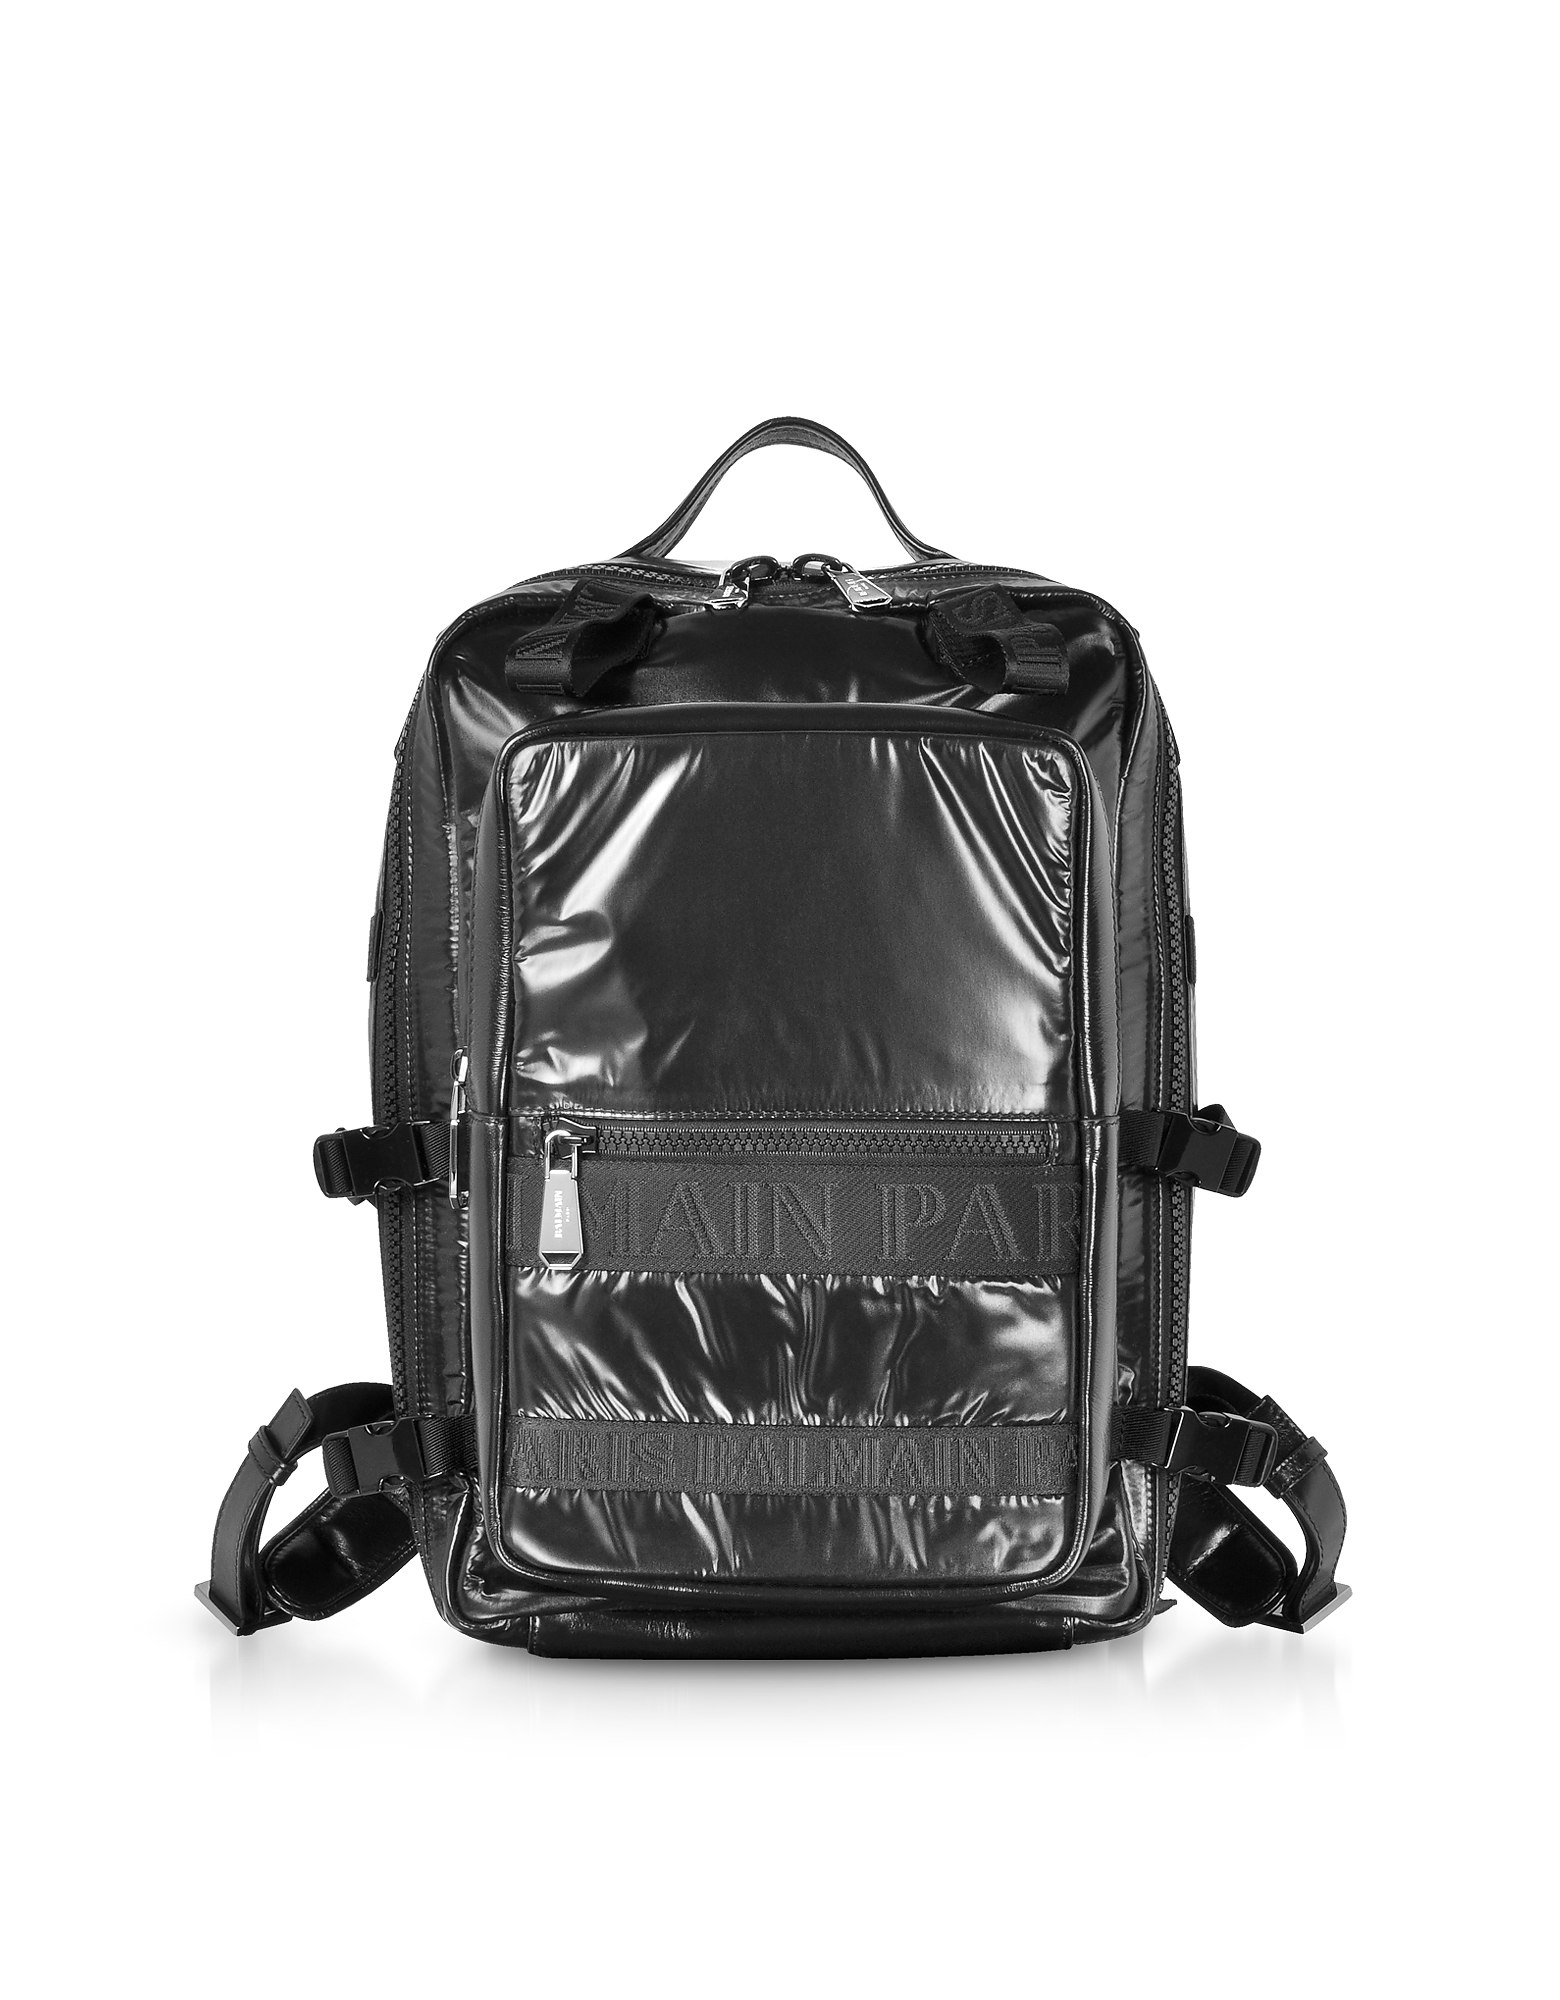 Image of Balmain Designer Backpacks, Black Quilted Nylon and Shiny Leather Men's Backpack